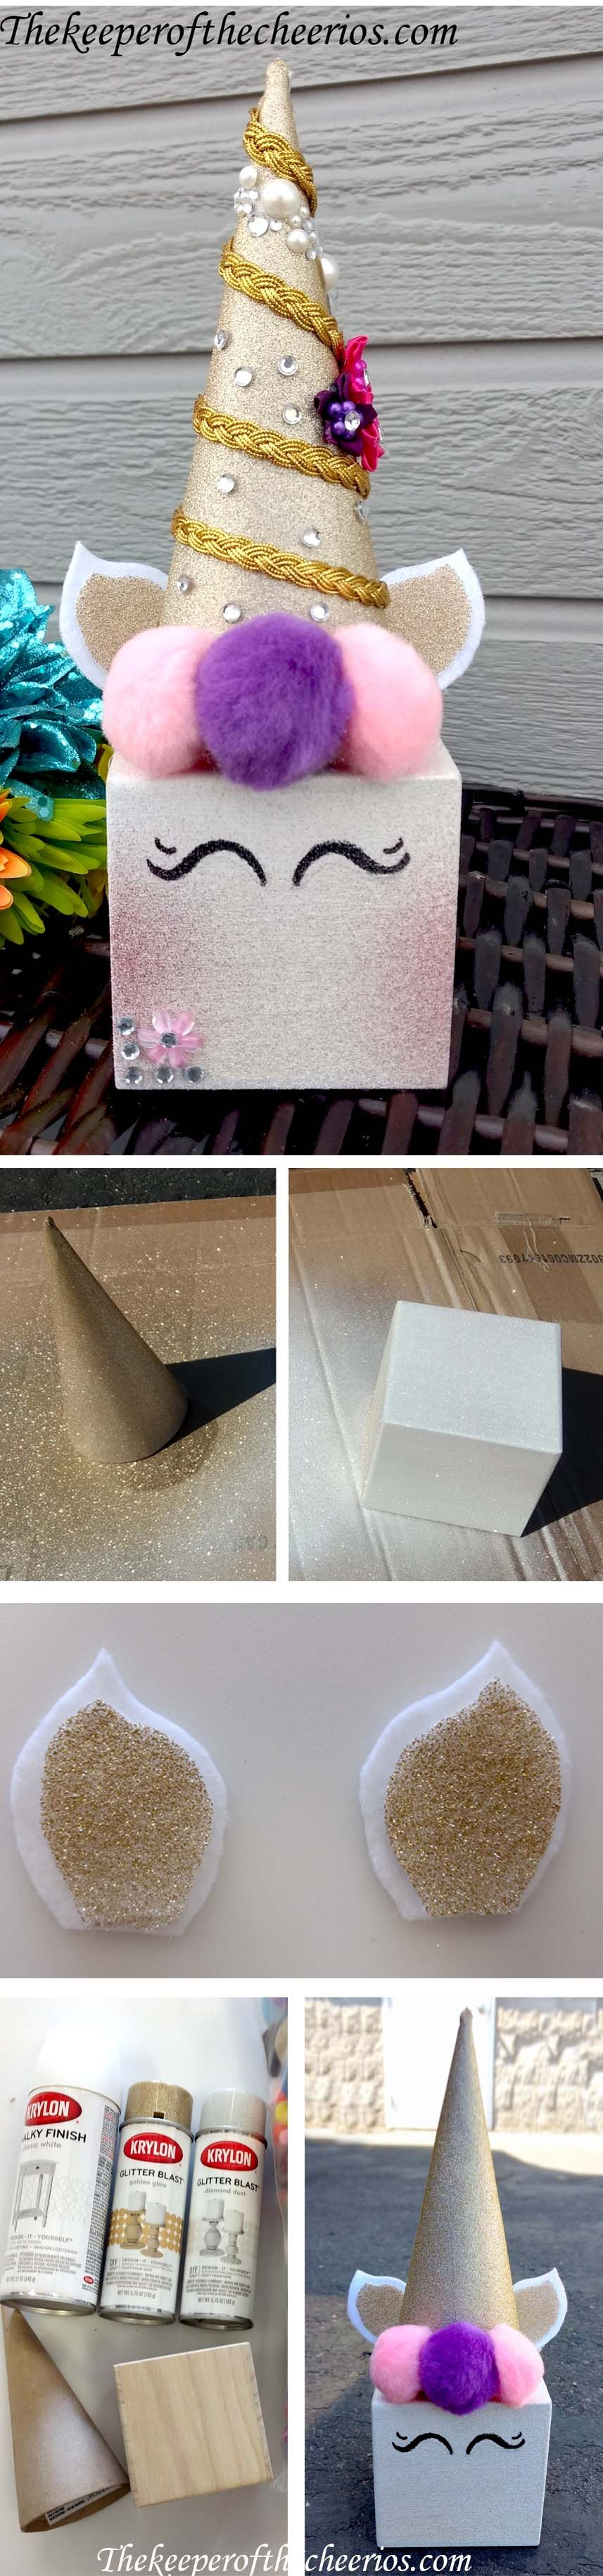 Unicorn Centerpiece Idea The Keeper Of The Cheerios Crafts